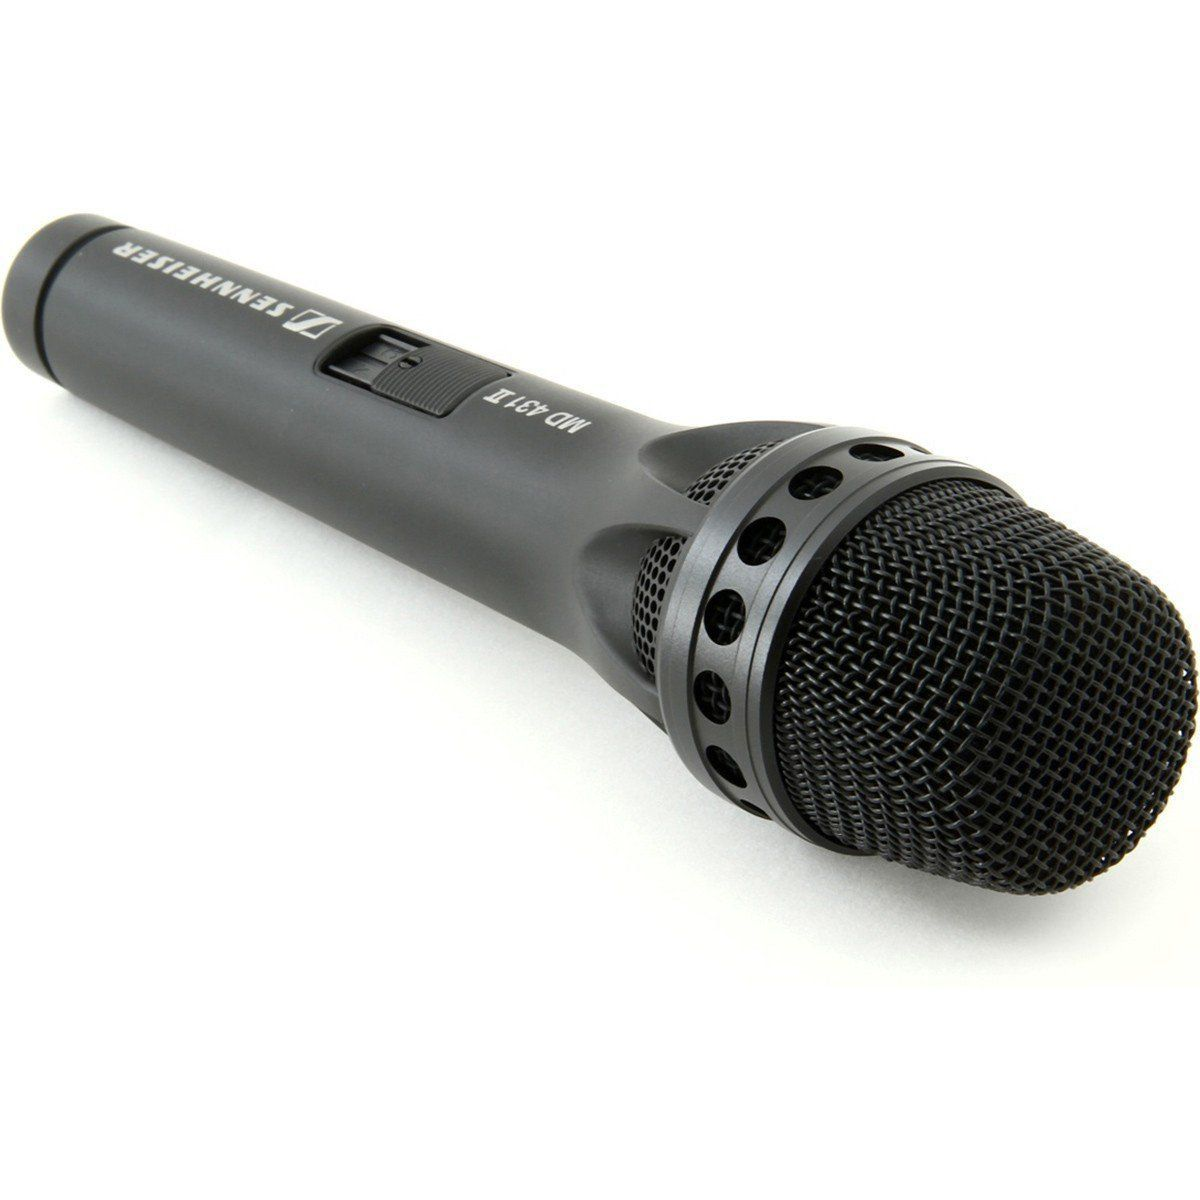 Sennheiser MD 431-II Microfone Dinâmico SuperCardioide Sennheiser MD431-II para Vocal